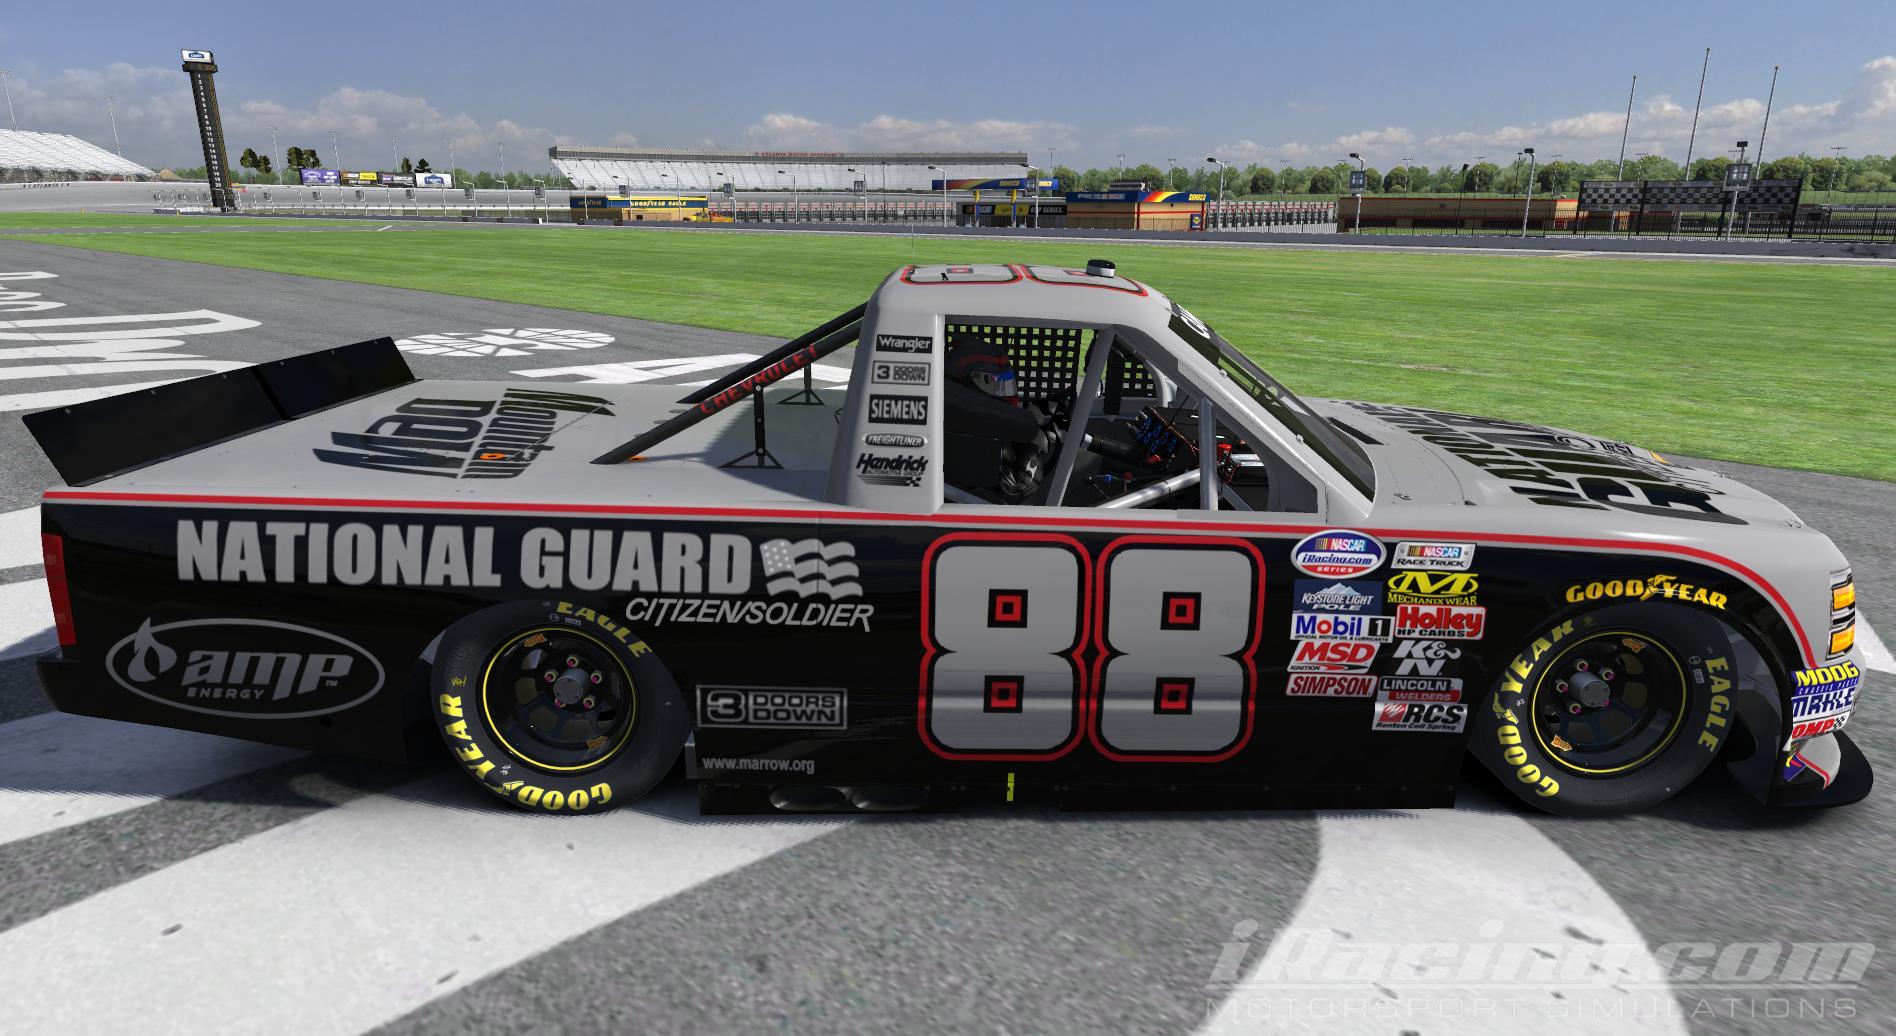 High Quality Dale Earnhardt Jr. National Guard/Citizen Soldier Scheme Chevy Truck Paint  Scheme NASCAR Camping World Chevrolet Silverado By Matt Ballard PRO